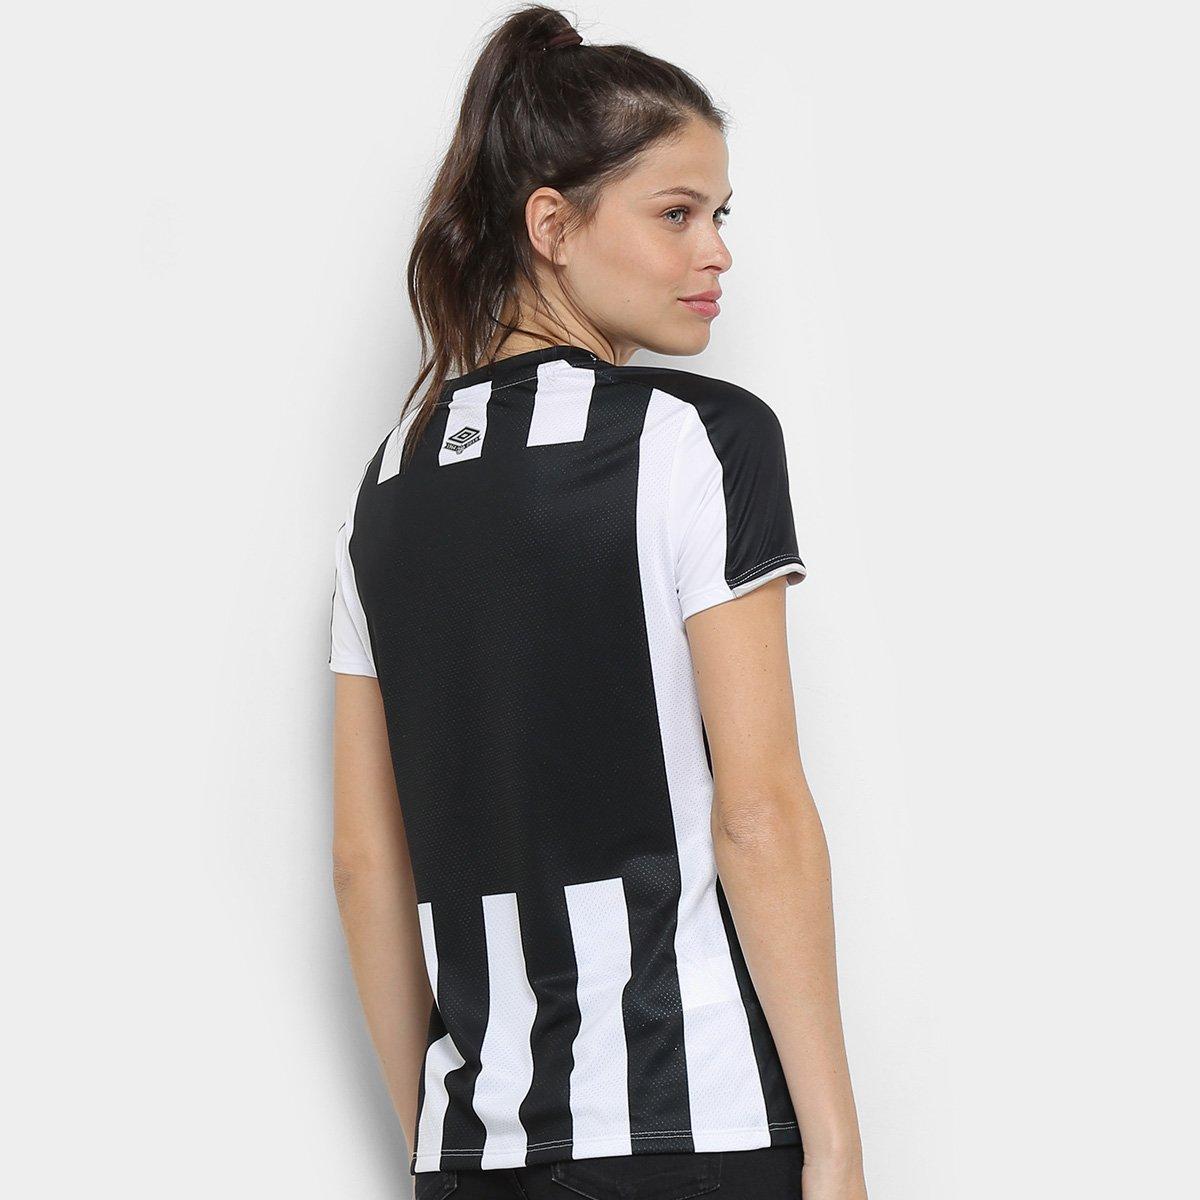 bb592ddd9 ... Pré-Venda Camisa Santos II 2019 s nº Torcedor Umbro Feminina ...